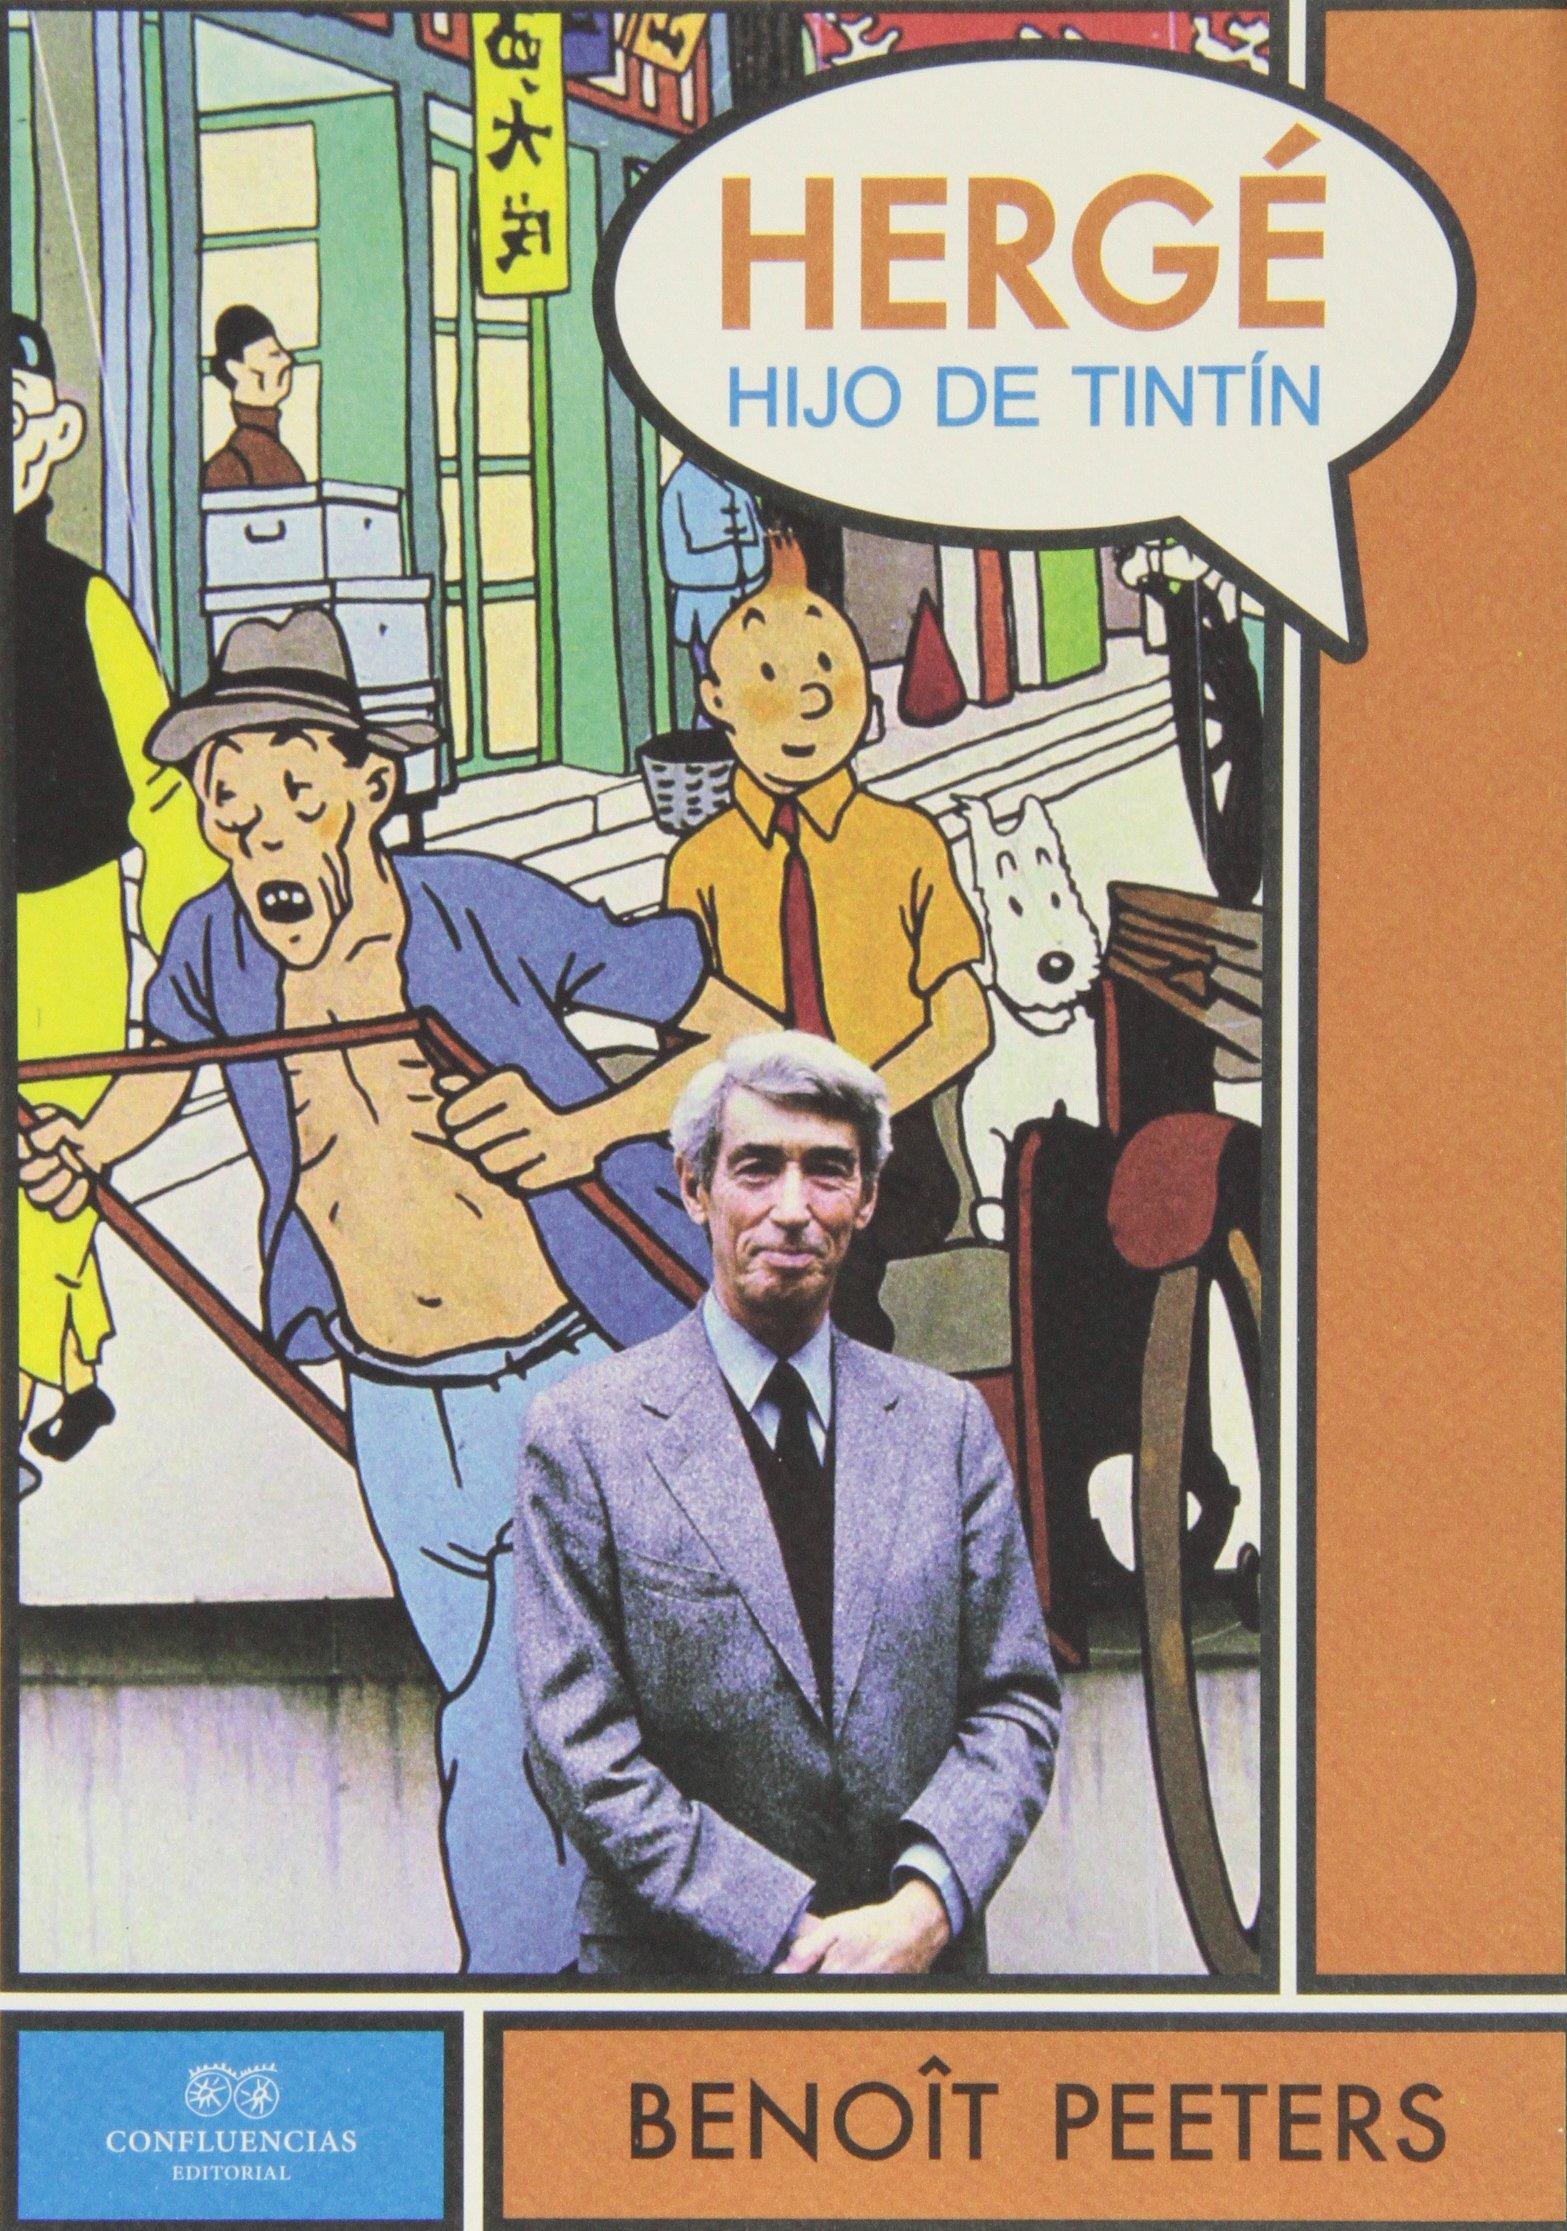 ¿Astérix o Tintín? - Página 7 91us9%2BYv%2BZL